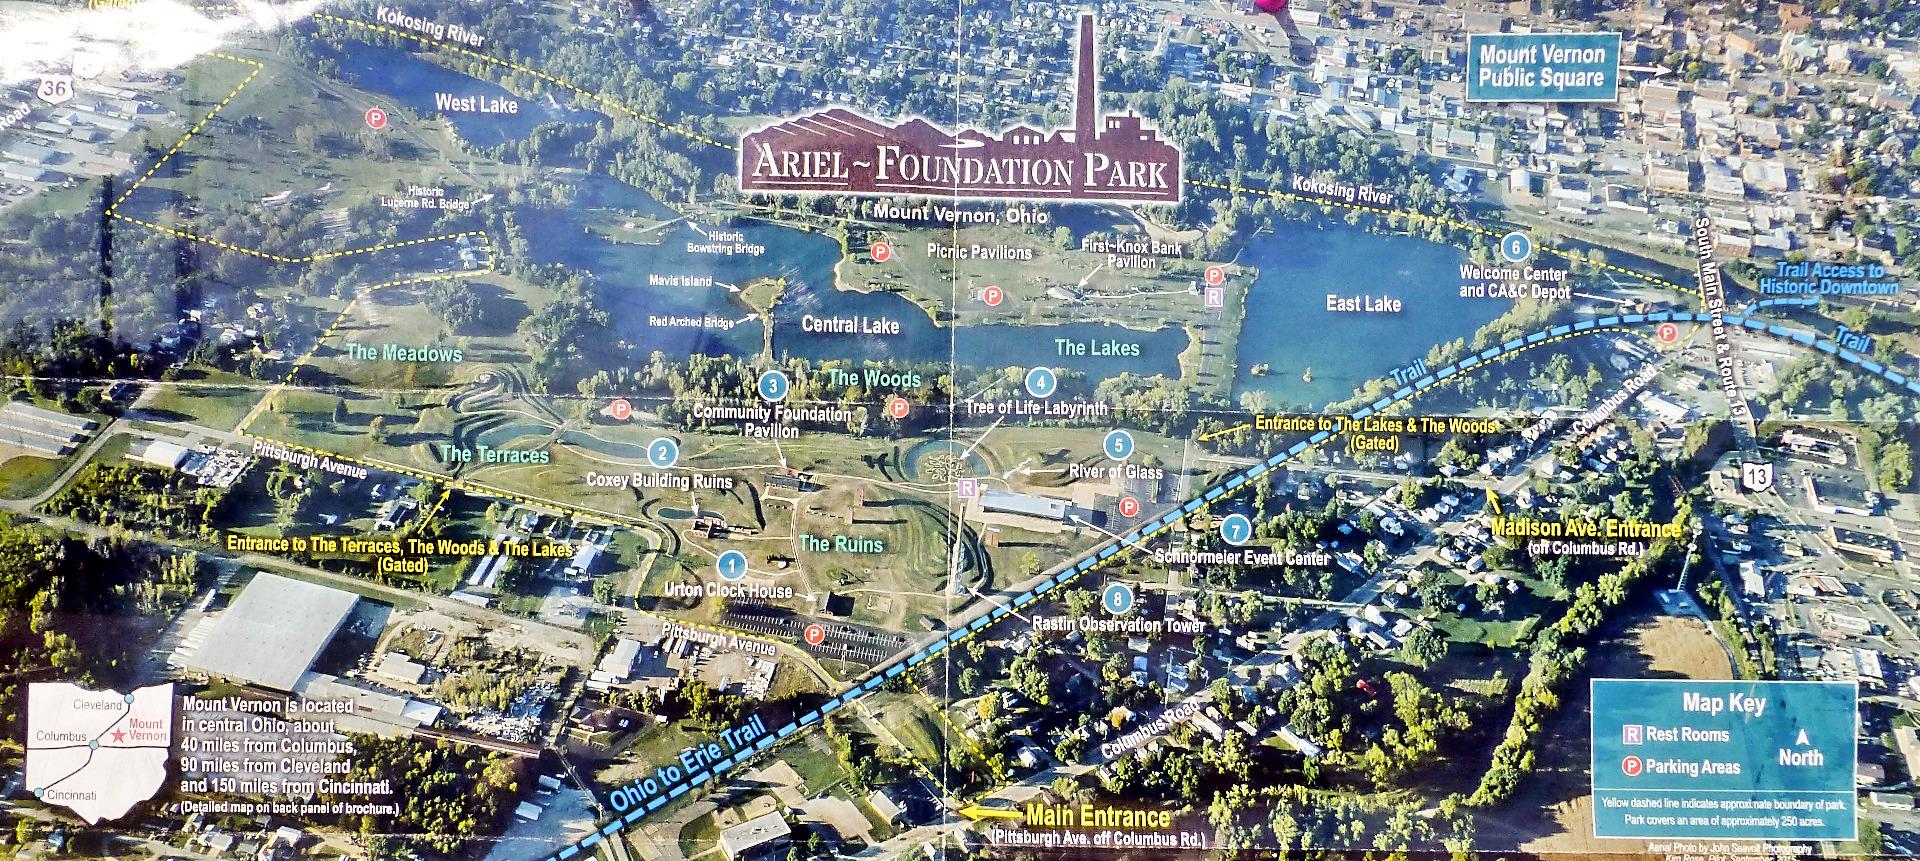 Ariel Foundation Park Trekohio